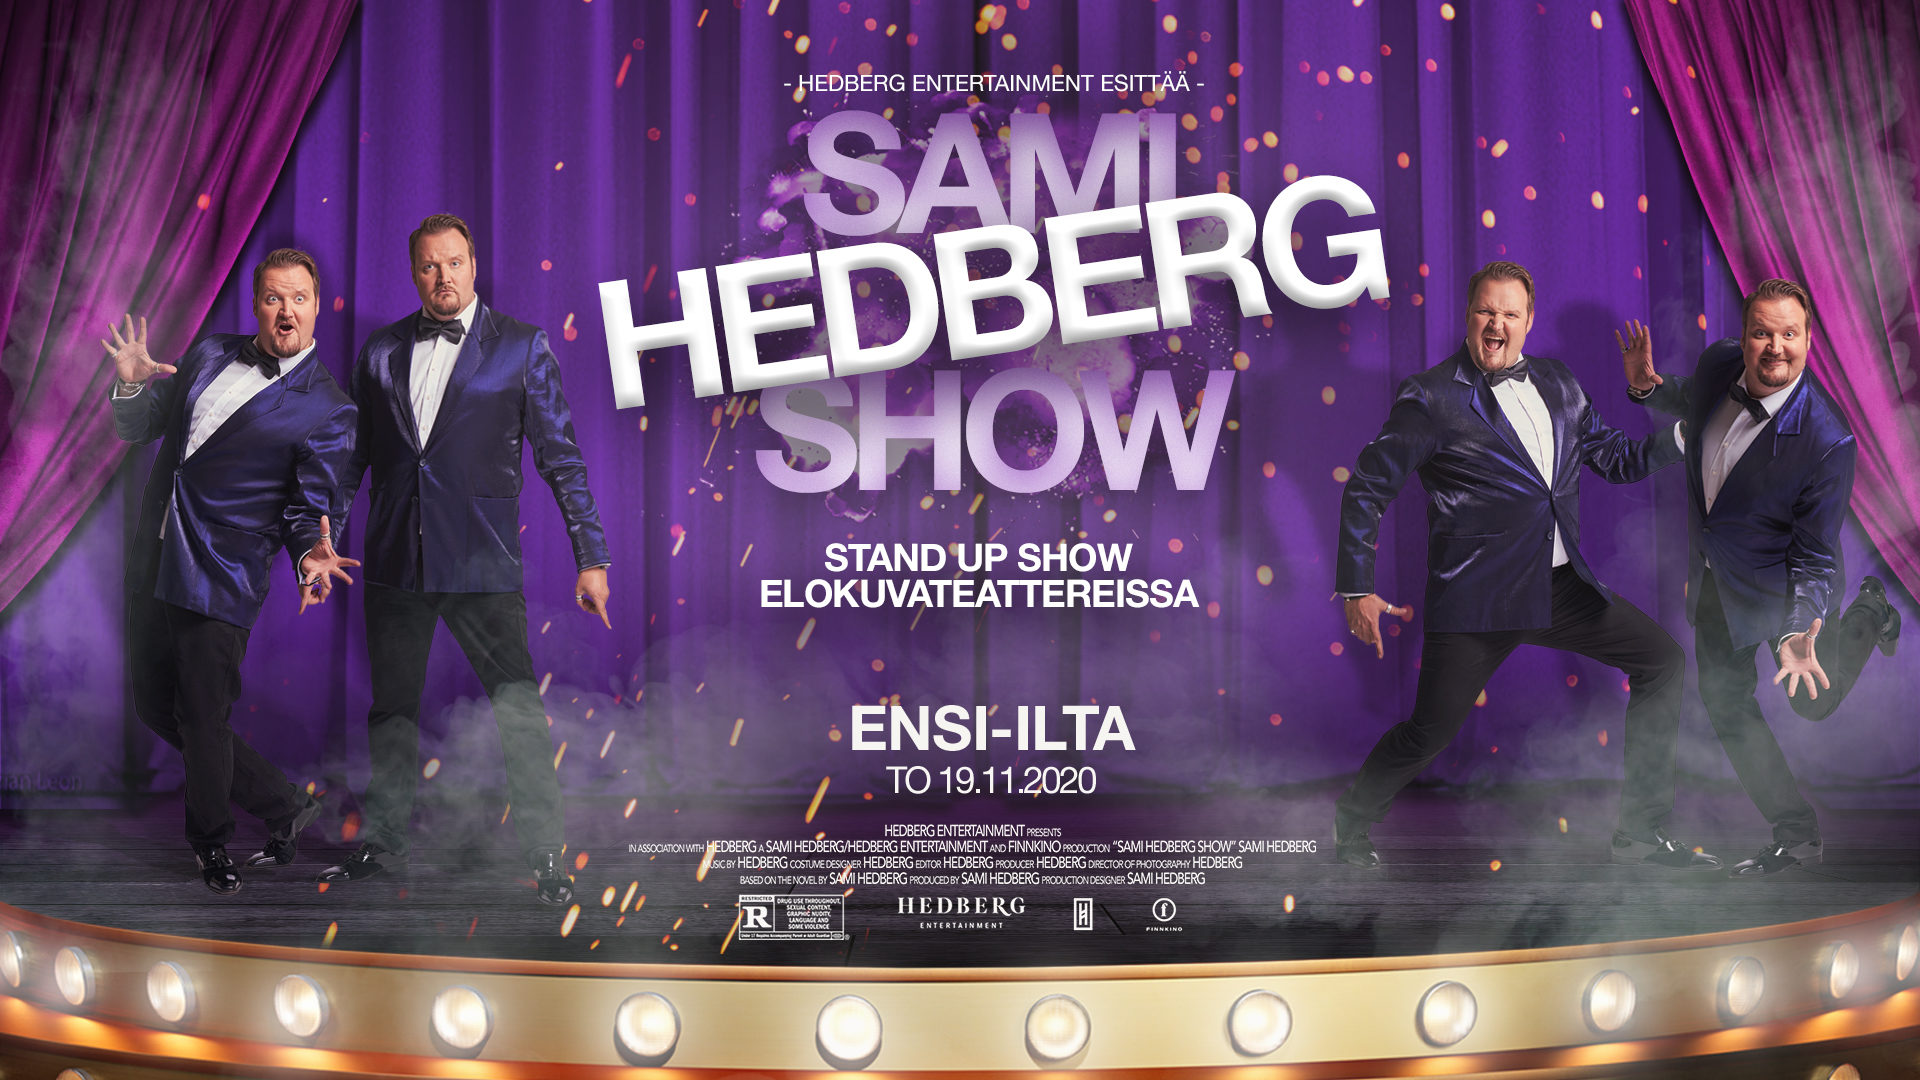 Sami Hedberg Show